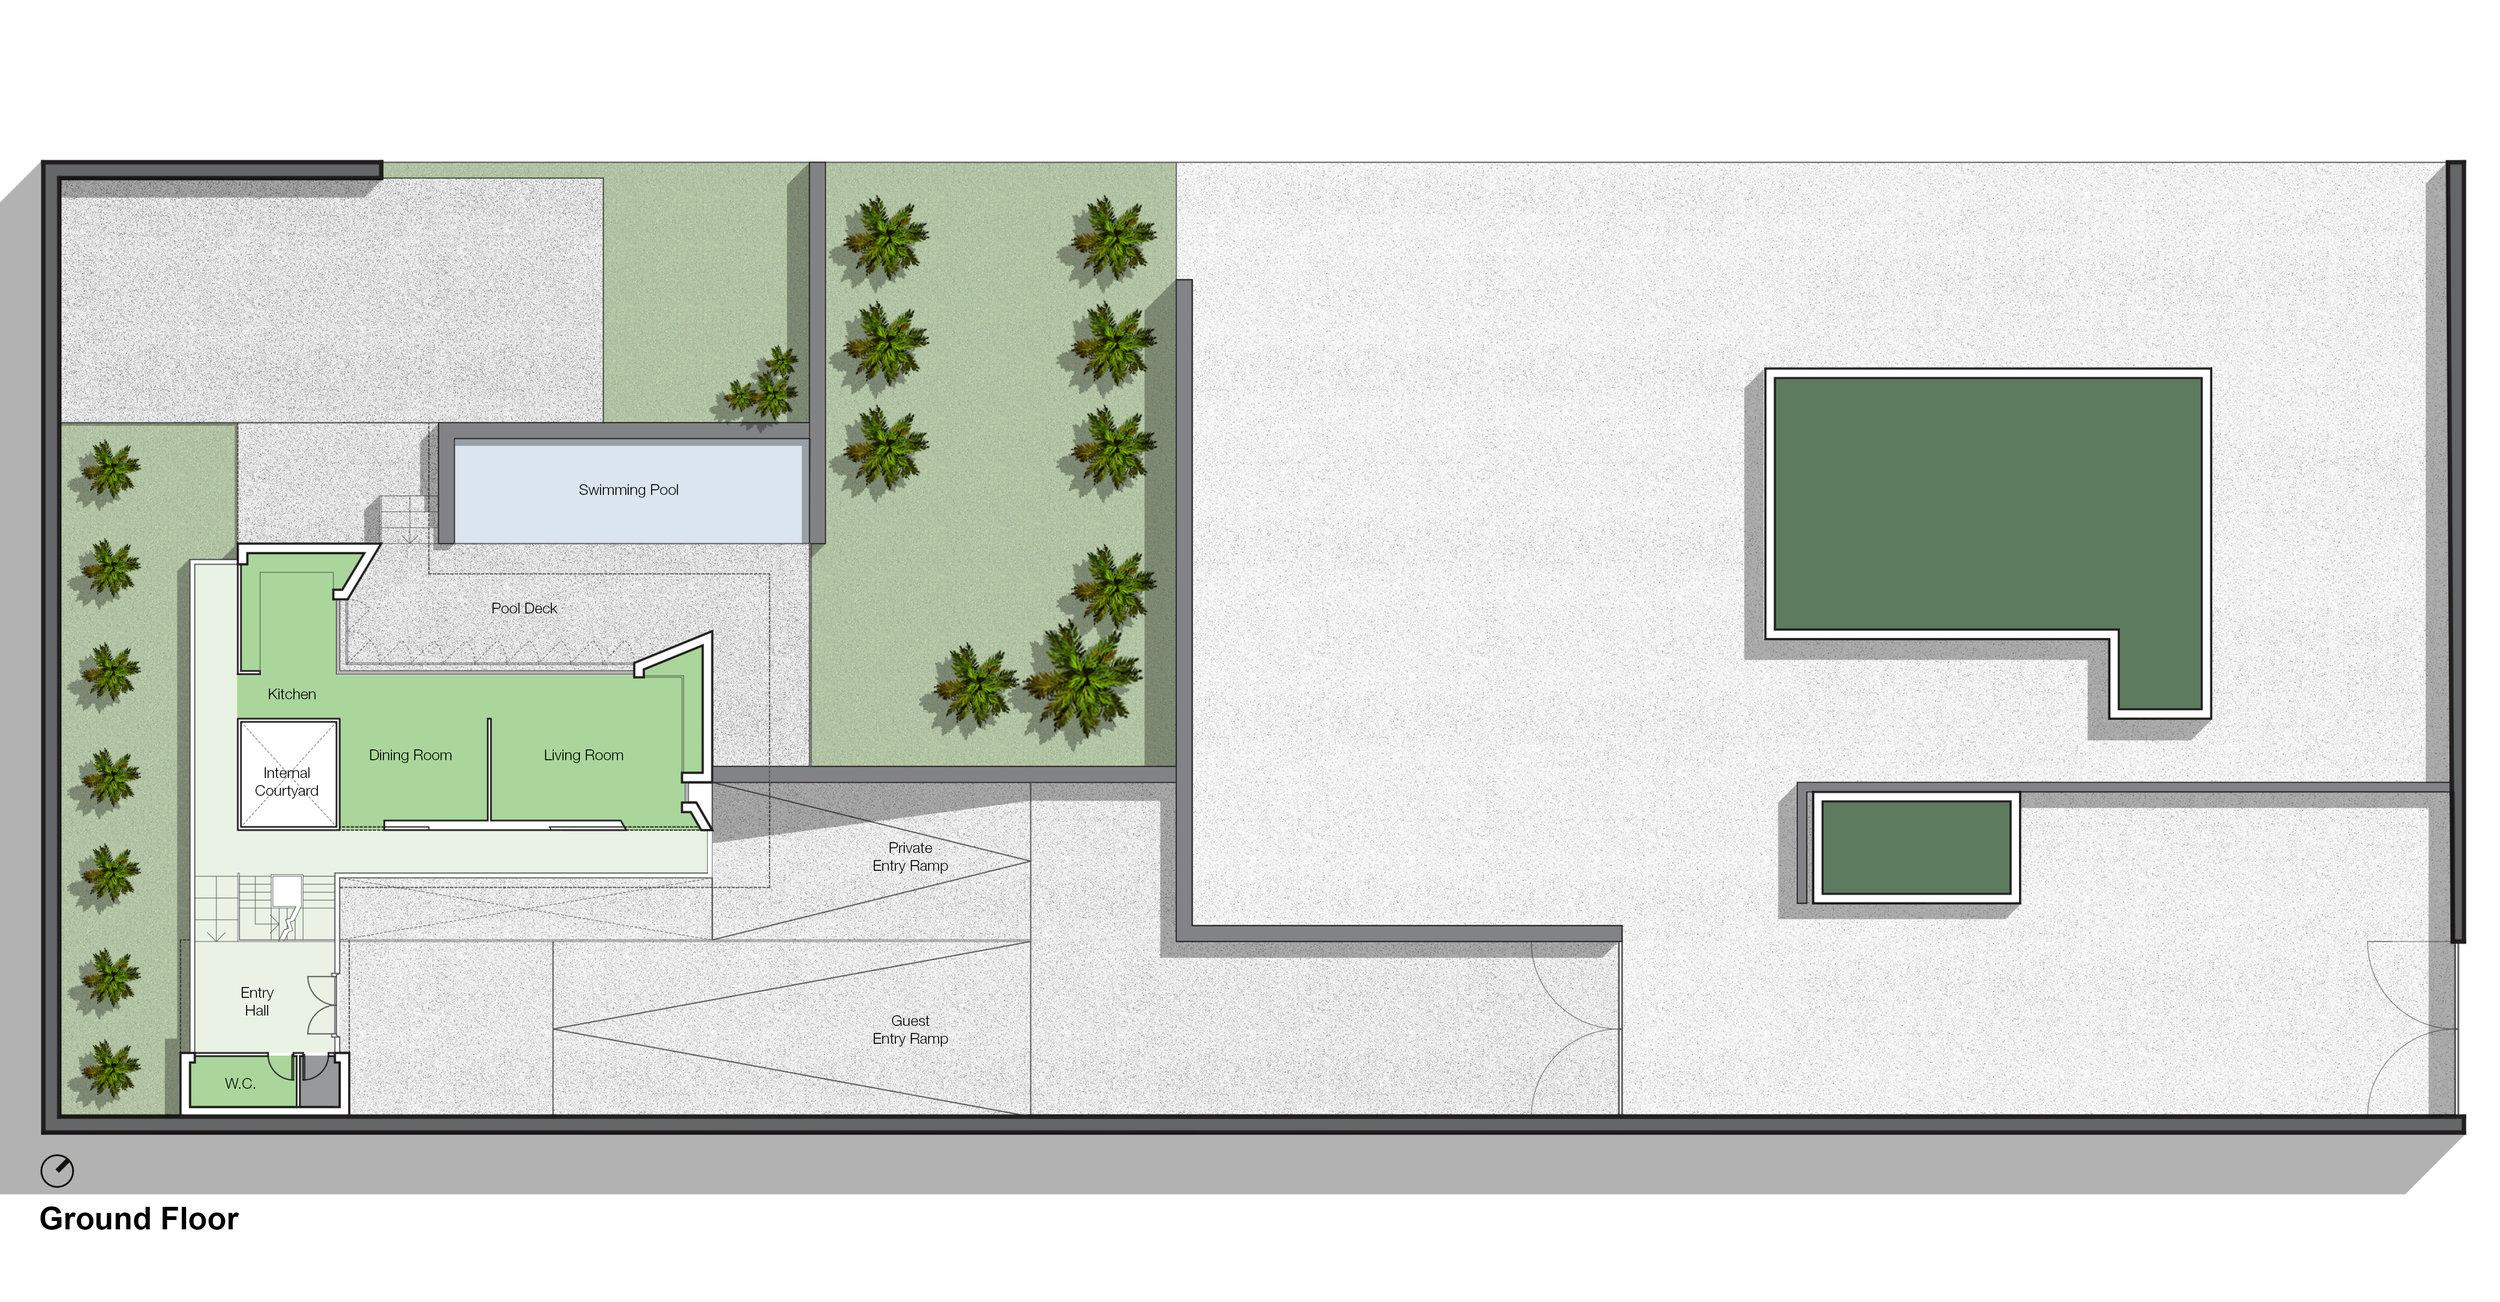 © Copyright Studio DS 2018 - the Beach Villa Ground Floor Plan